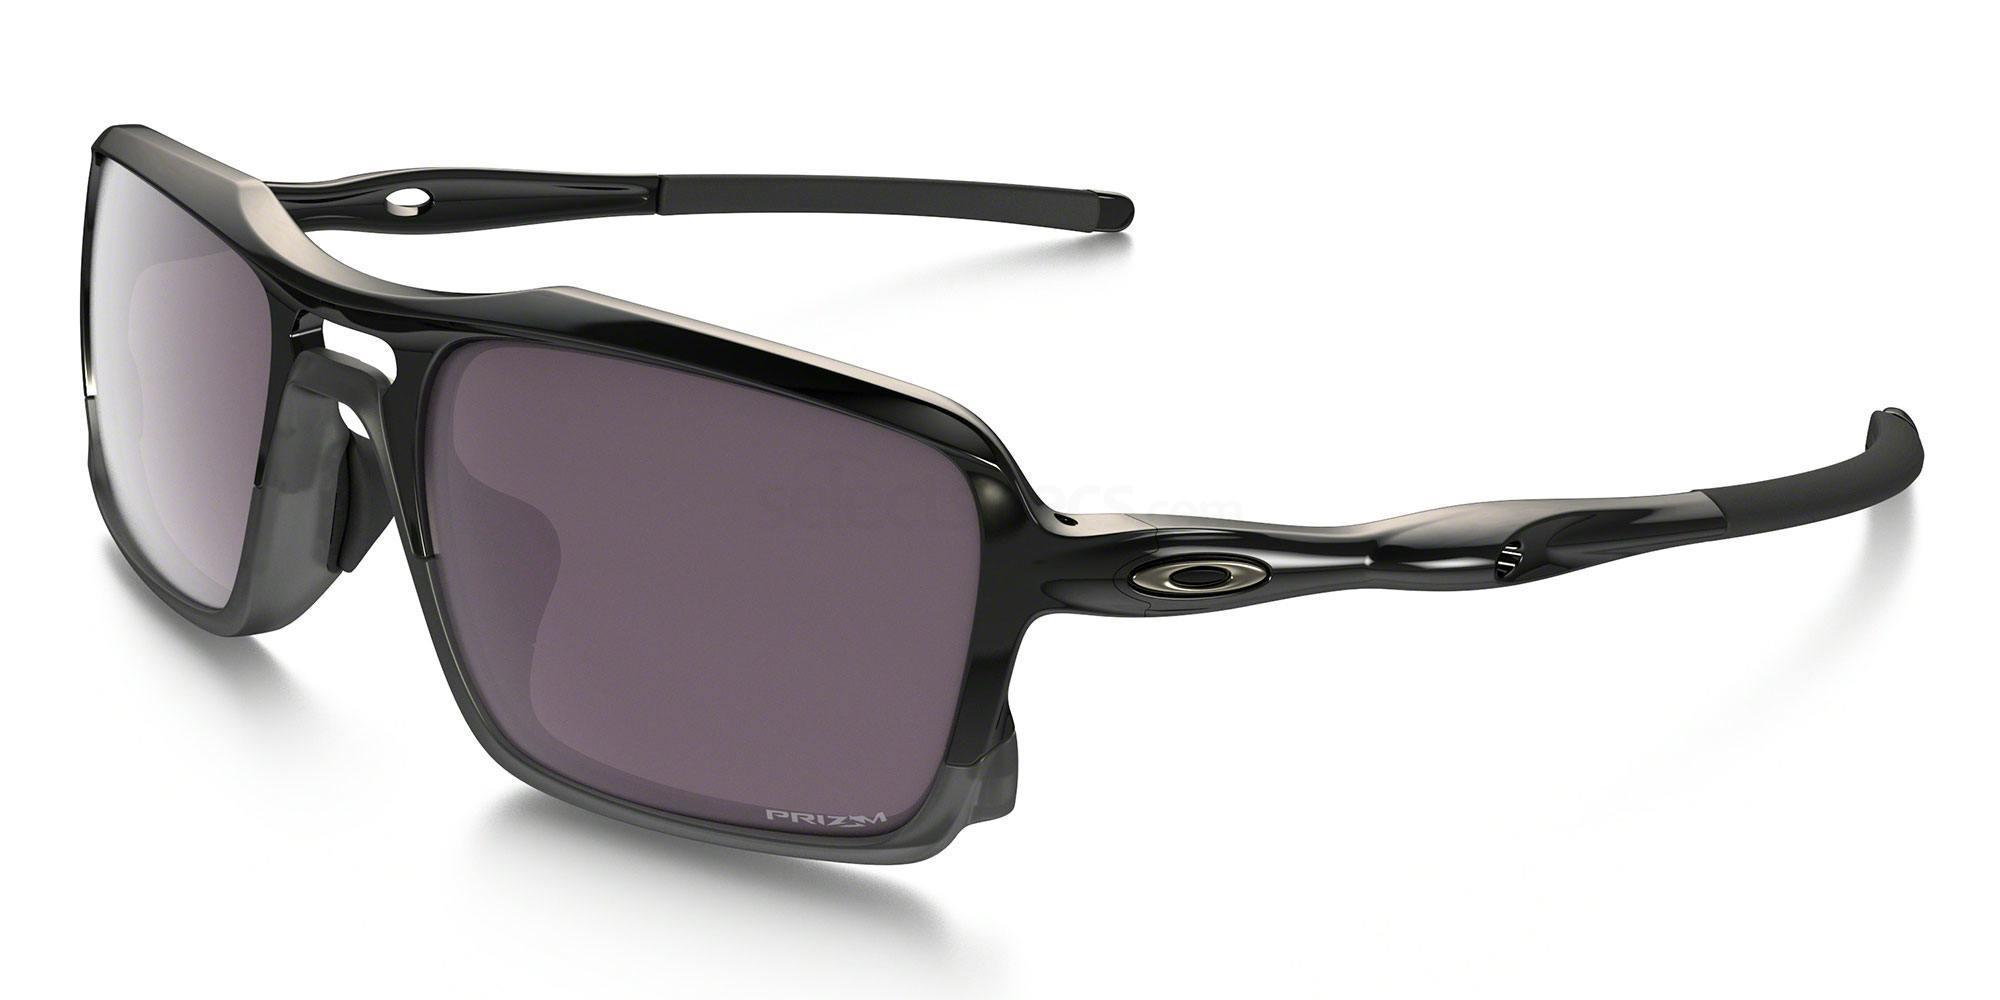 926606 OO9266 PRIZM DAILY POLARIZED TRIGGERMAN Sunglasses, Oakley